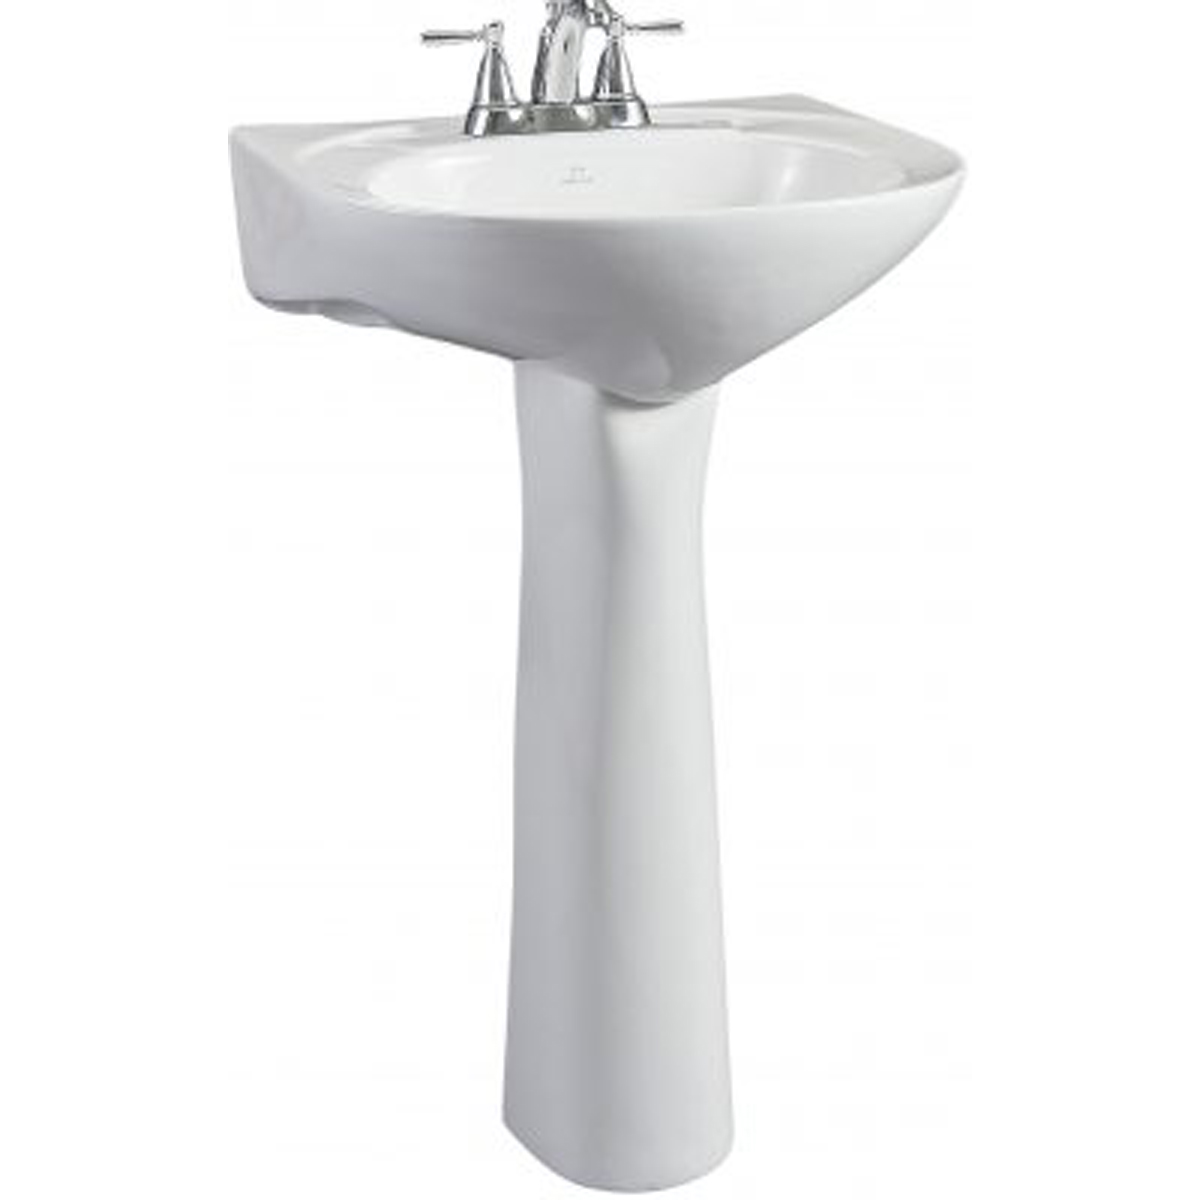 briggs altima white pedestal sink 4 center holes